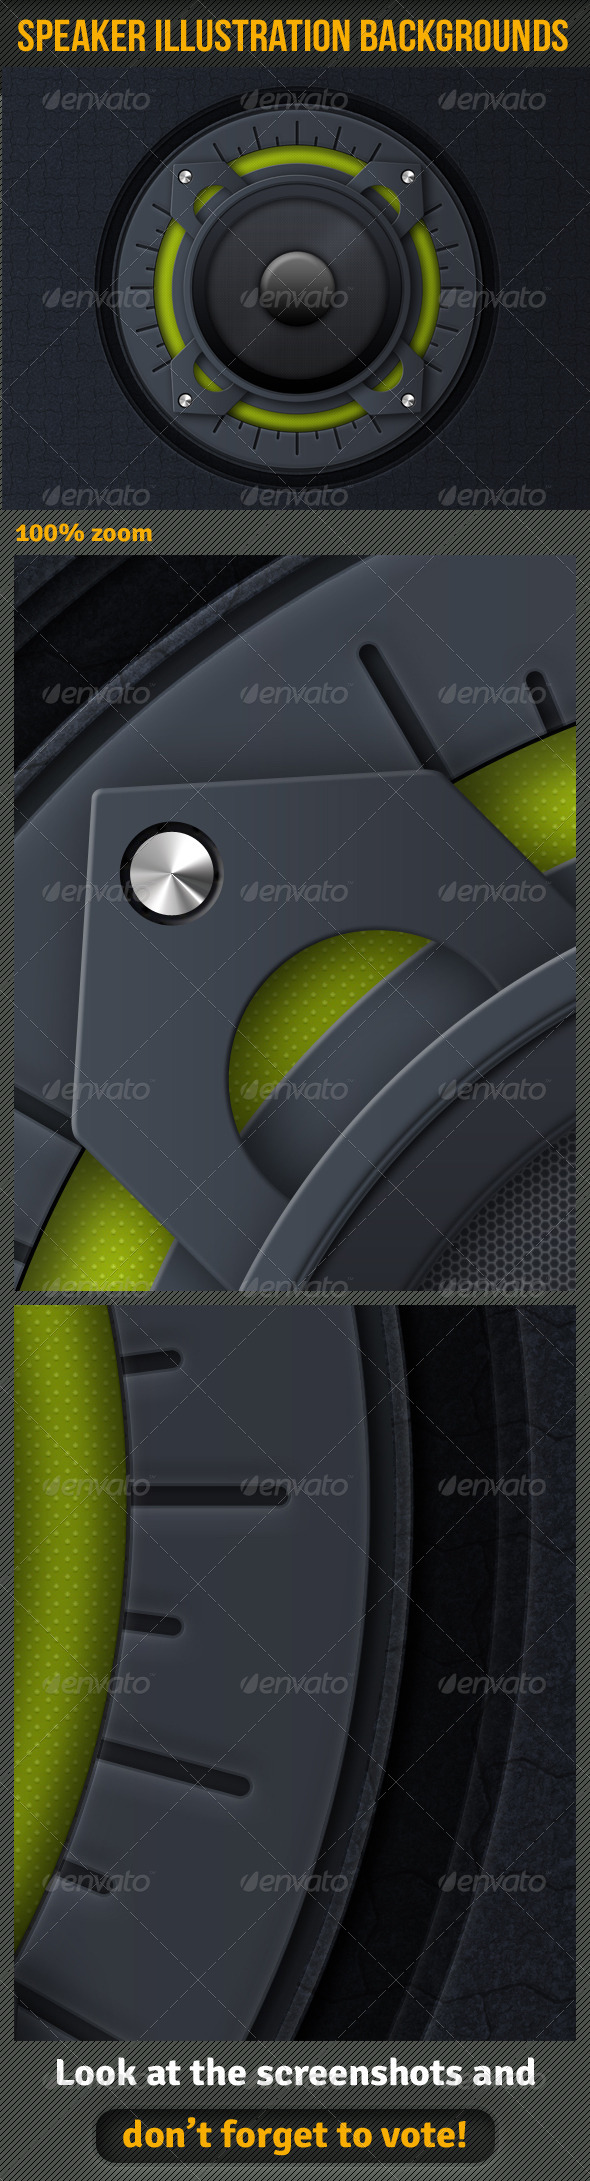 Speaker Illustration Background